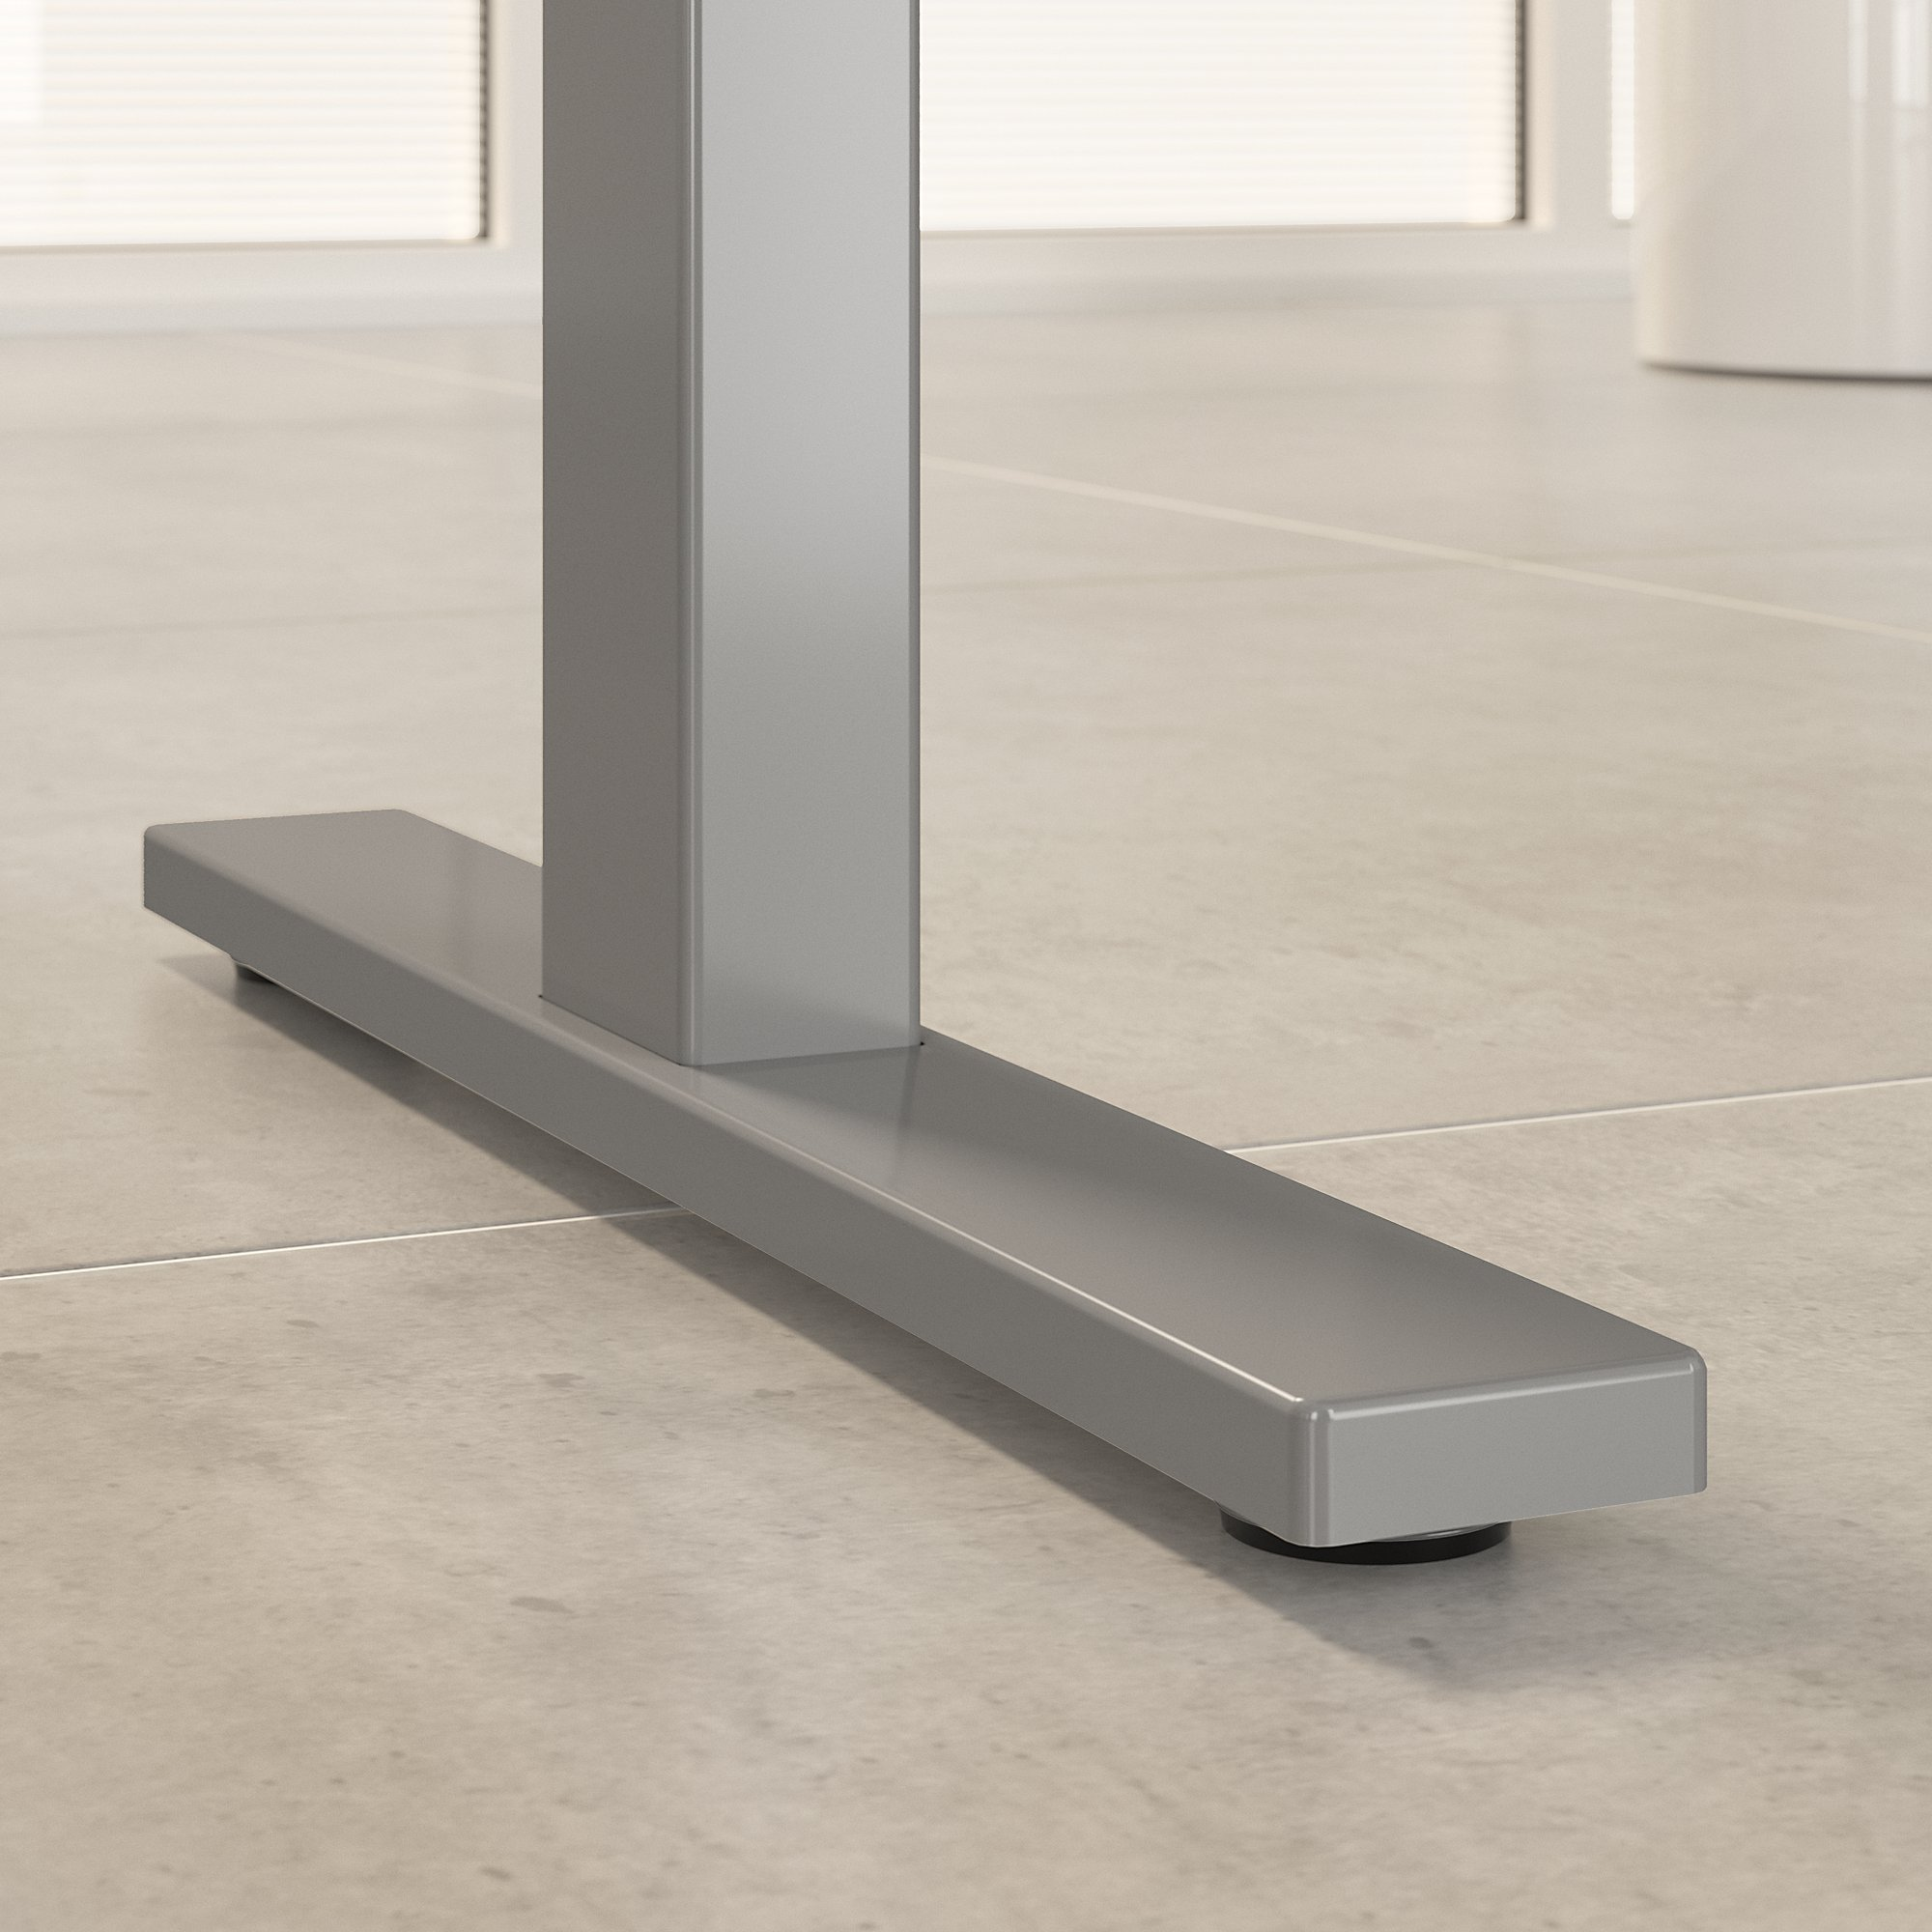 height adjustable desk leg